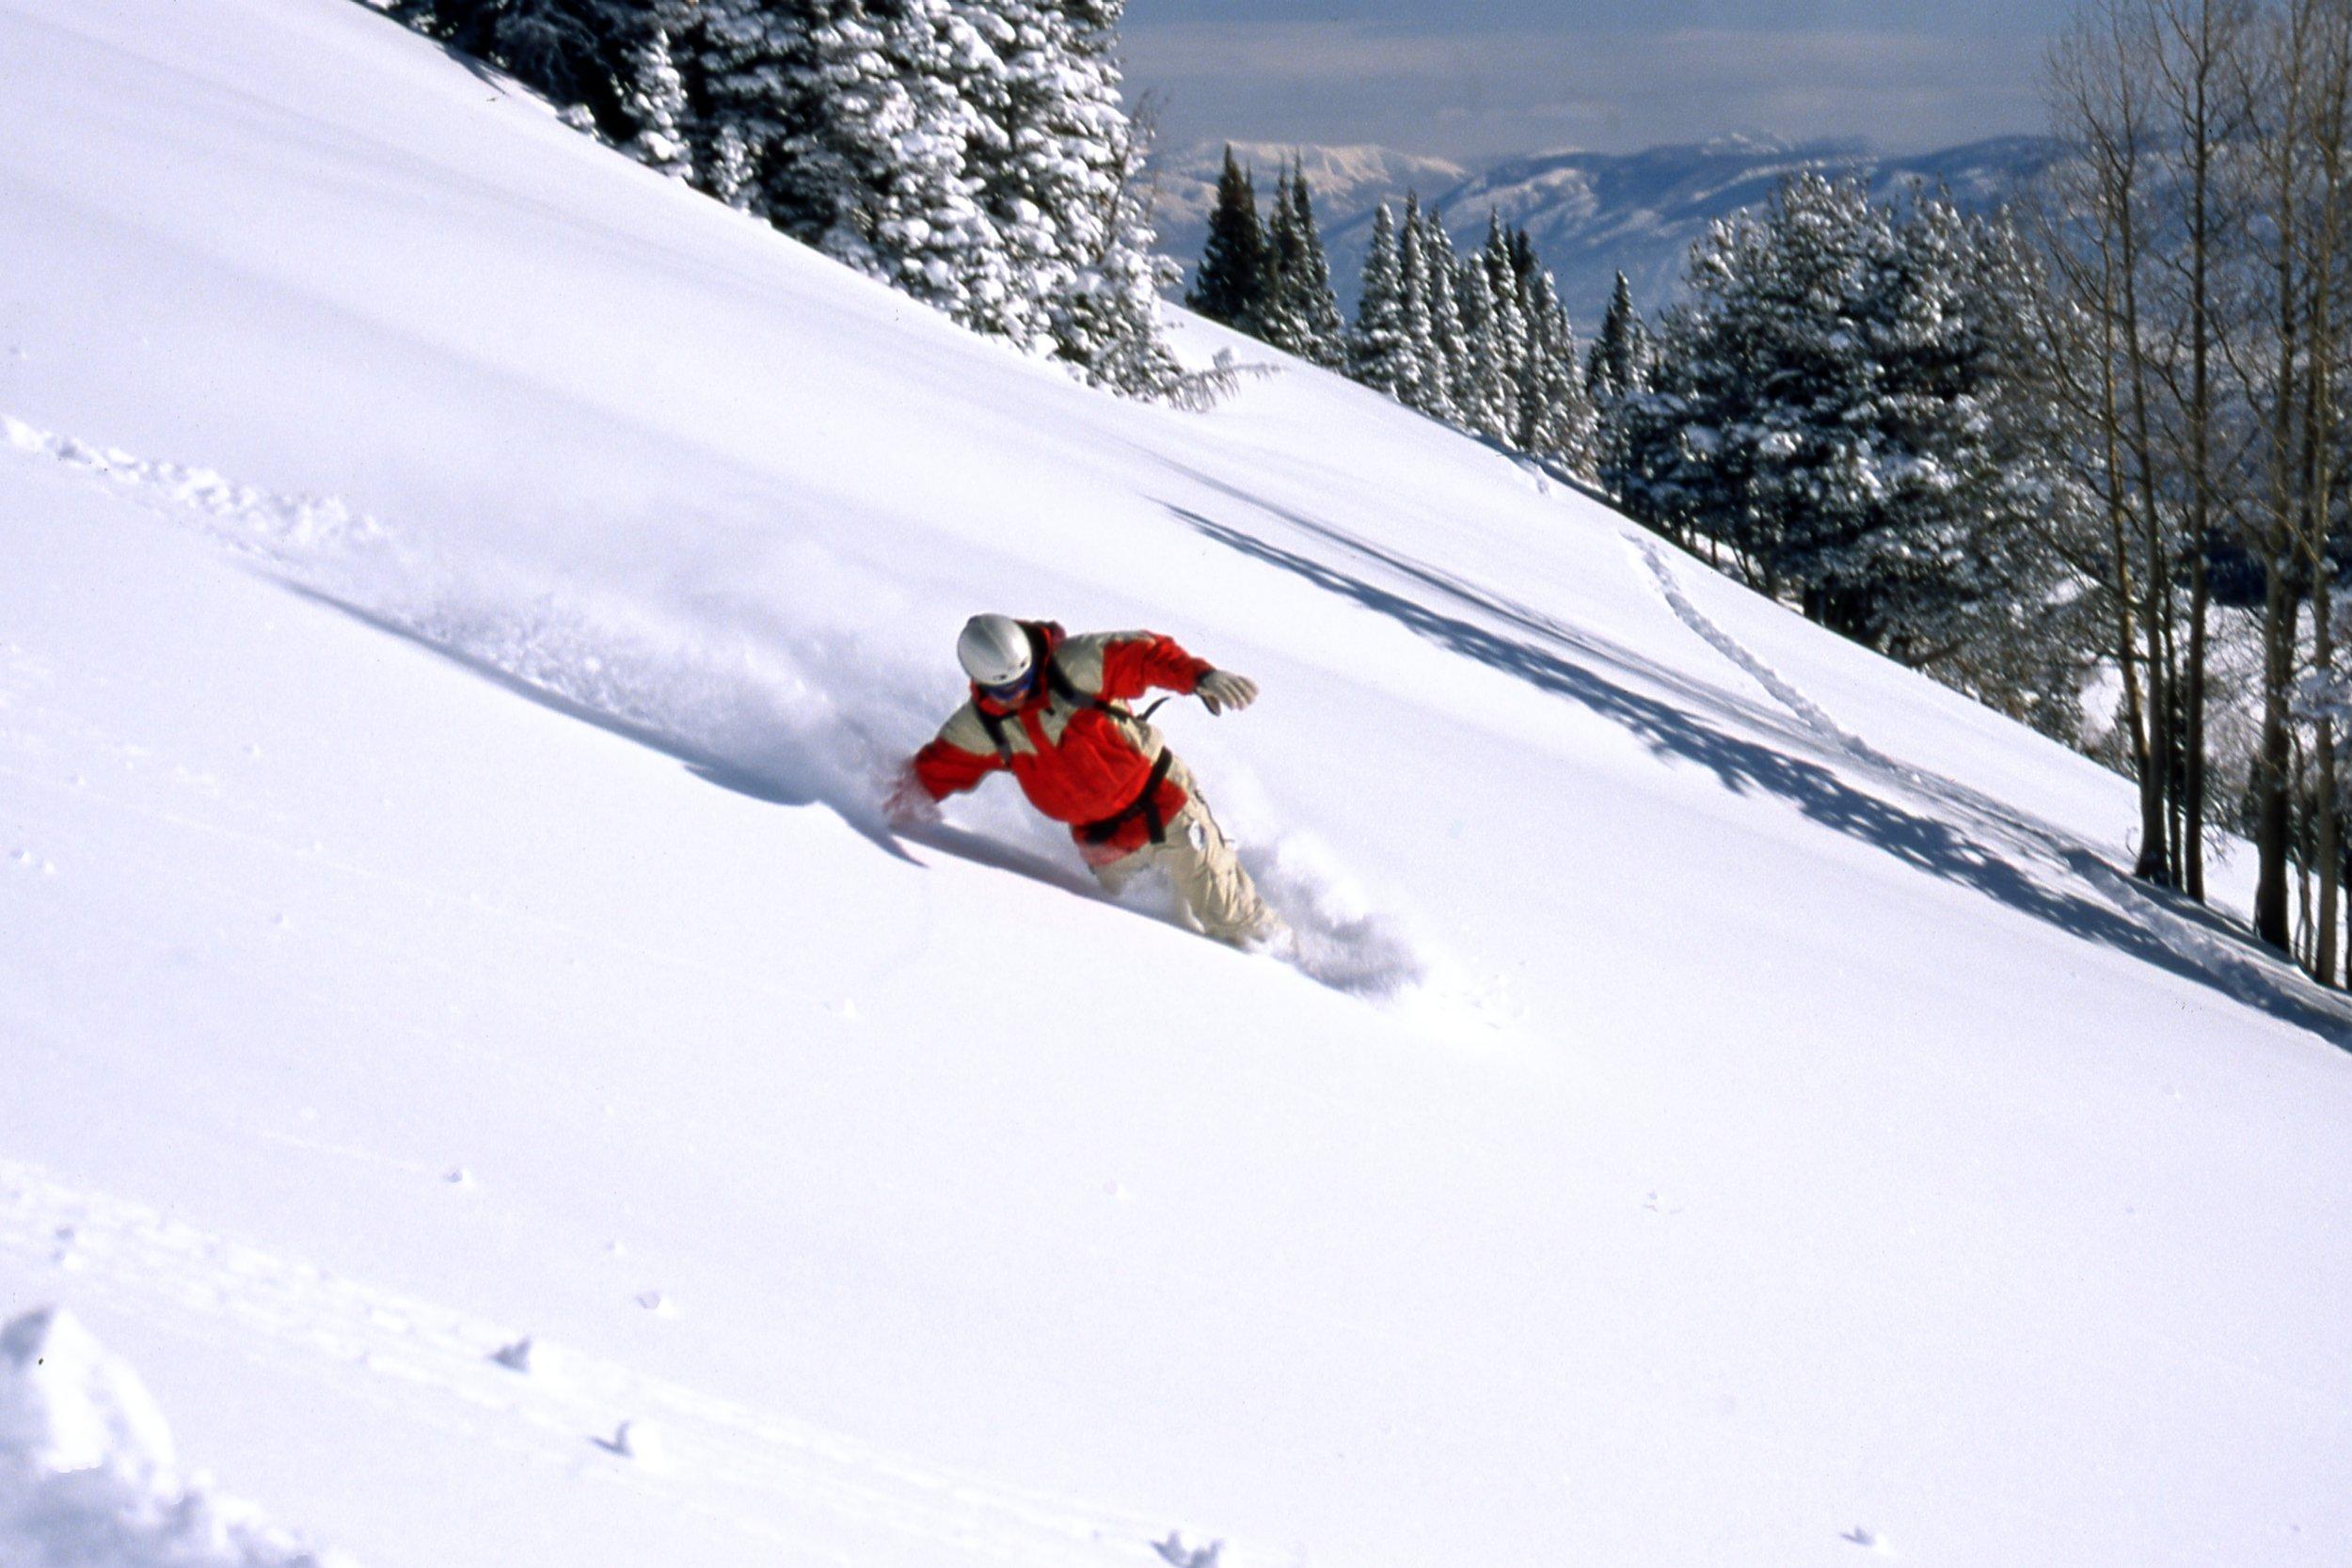 SNOWBOARDING IN THE UTAH BACKCOUNTRY